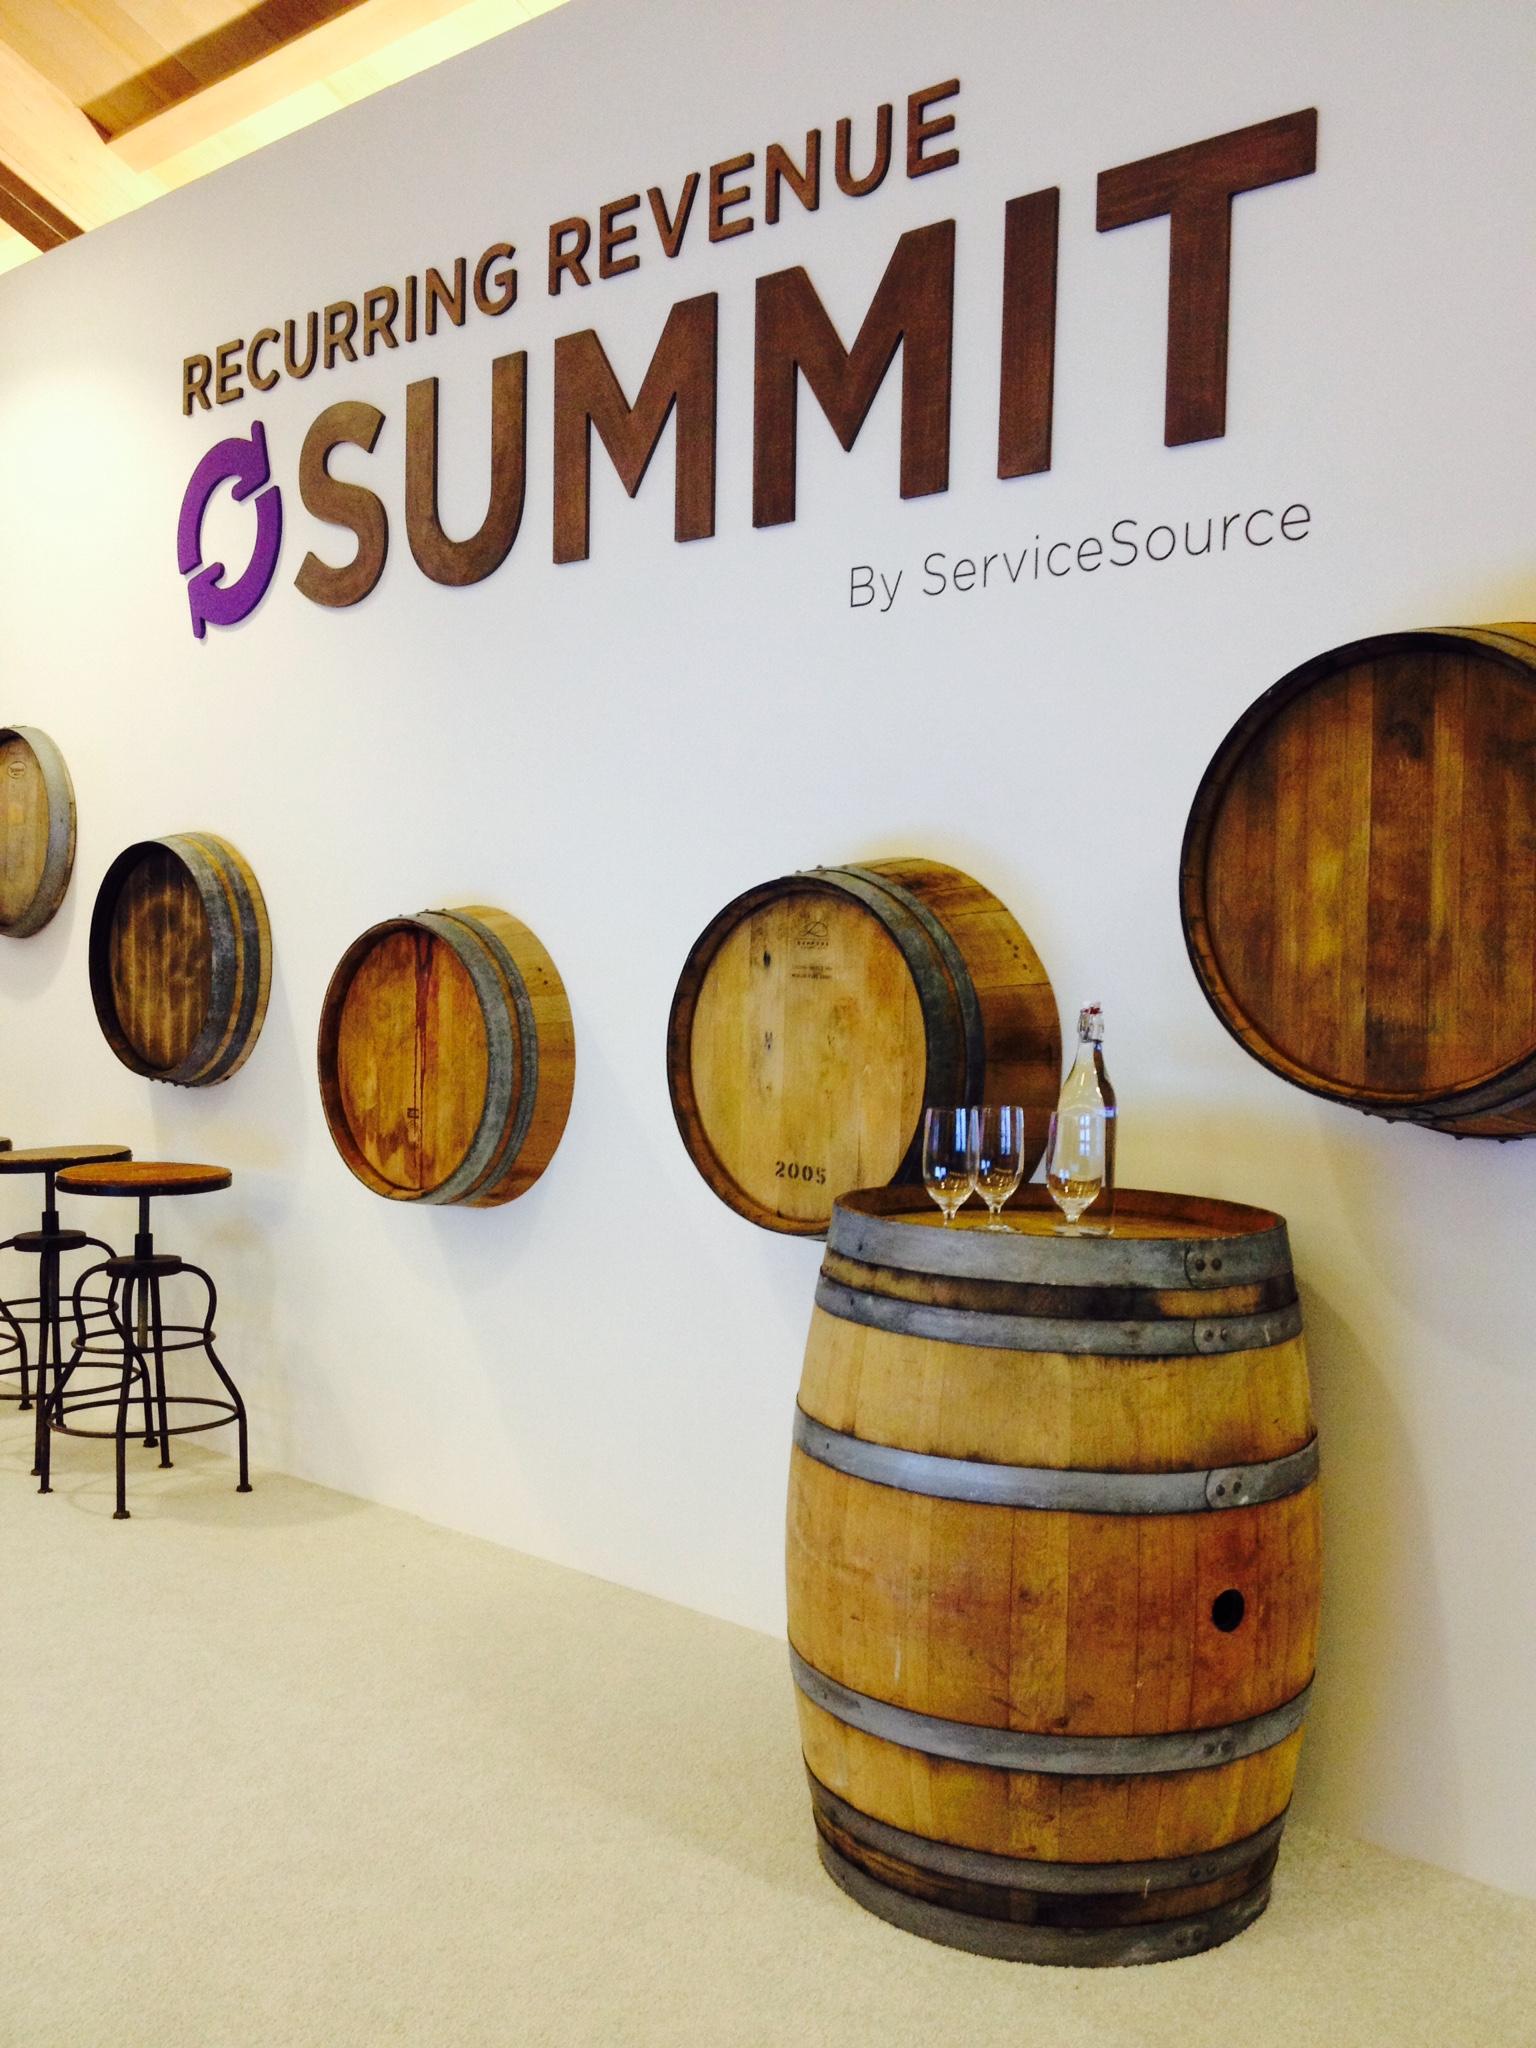 Service Source Recurring Revenue Summit